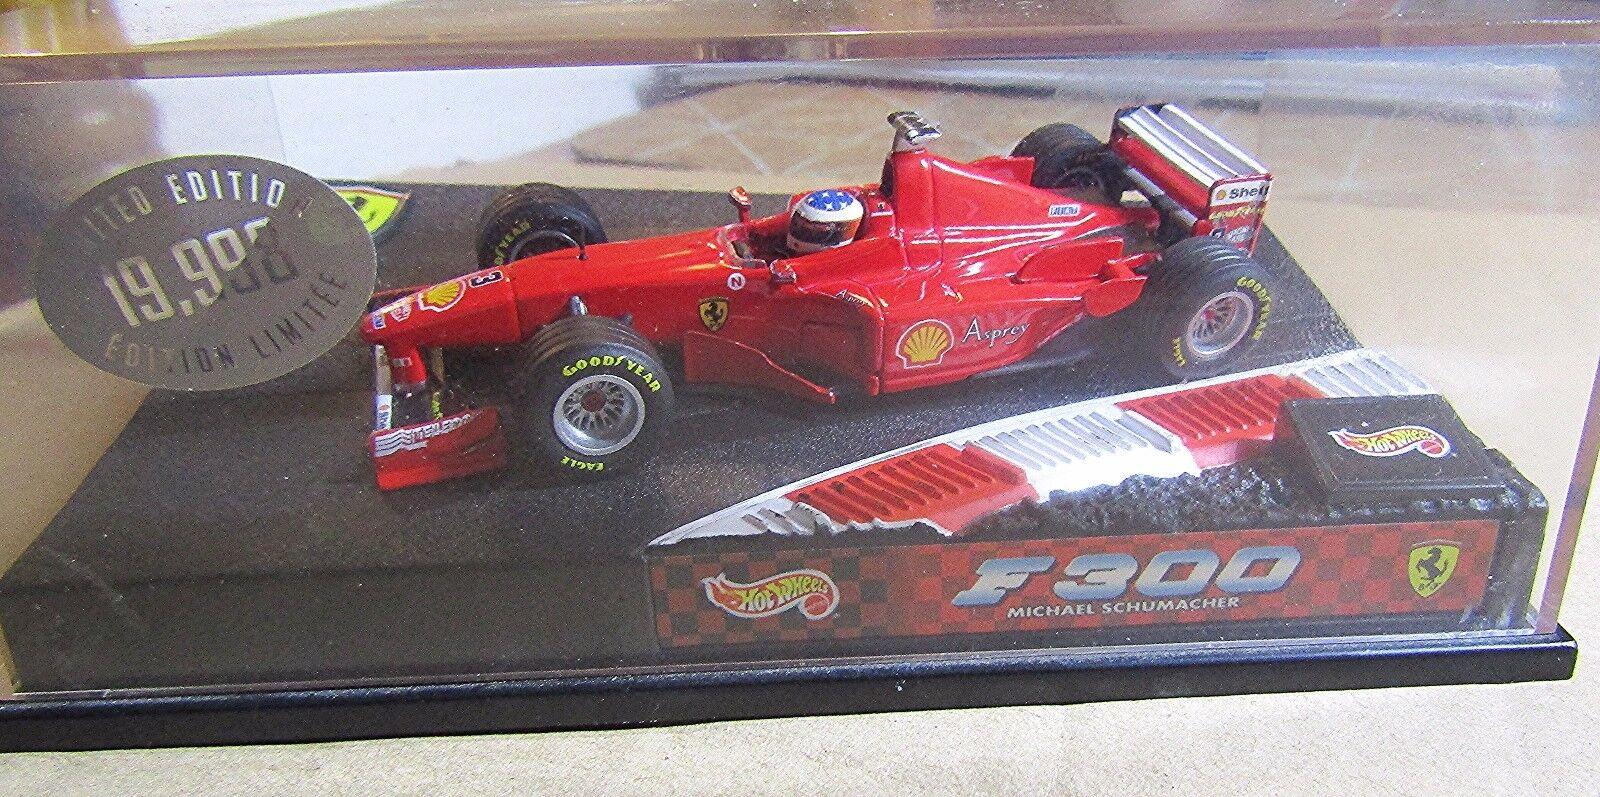 Hot Wheels Ferrari F300 escala 1 43  Edición Limitada 19 998  Rojo